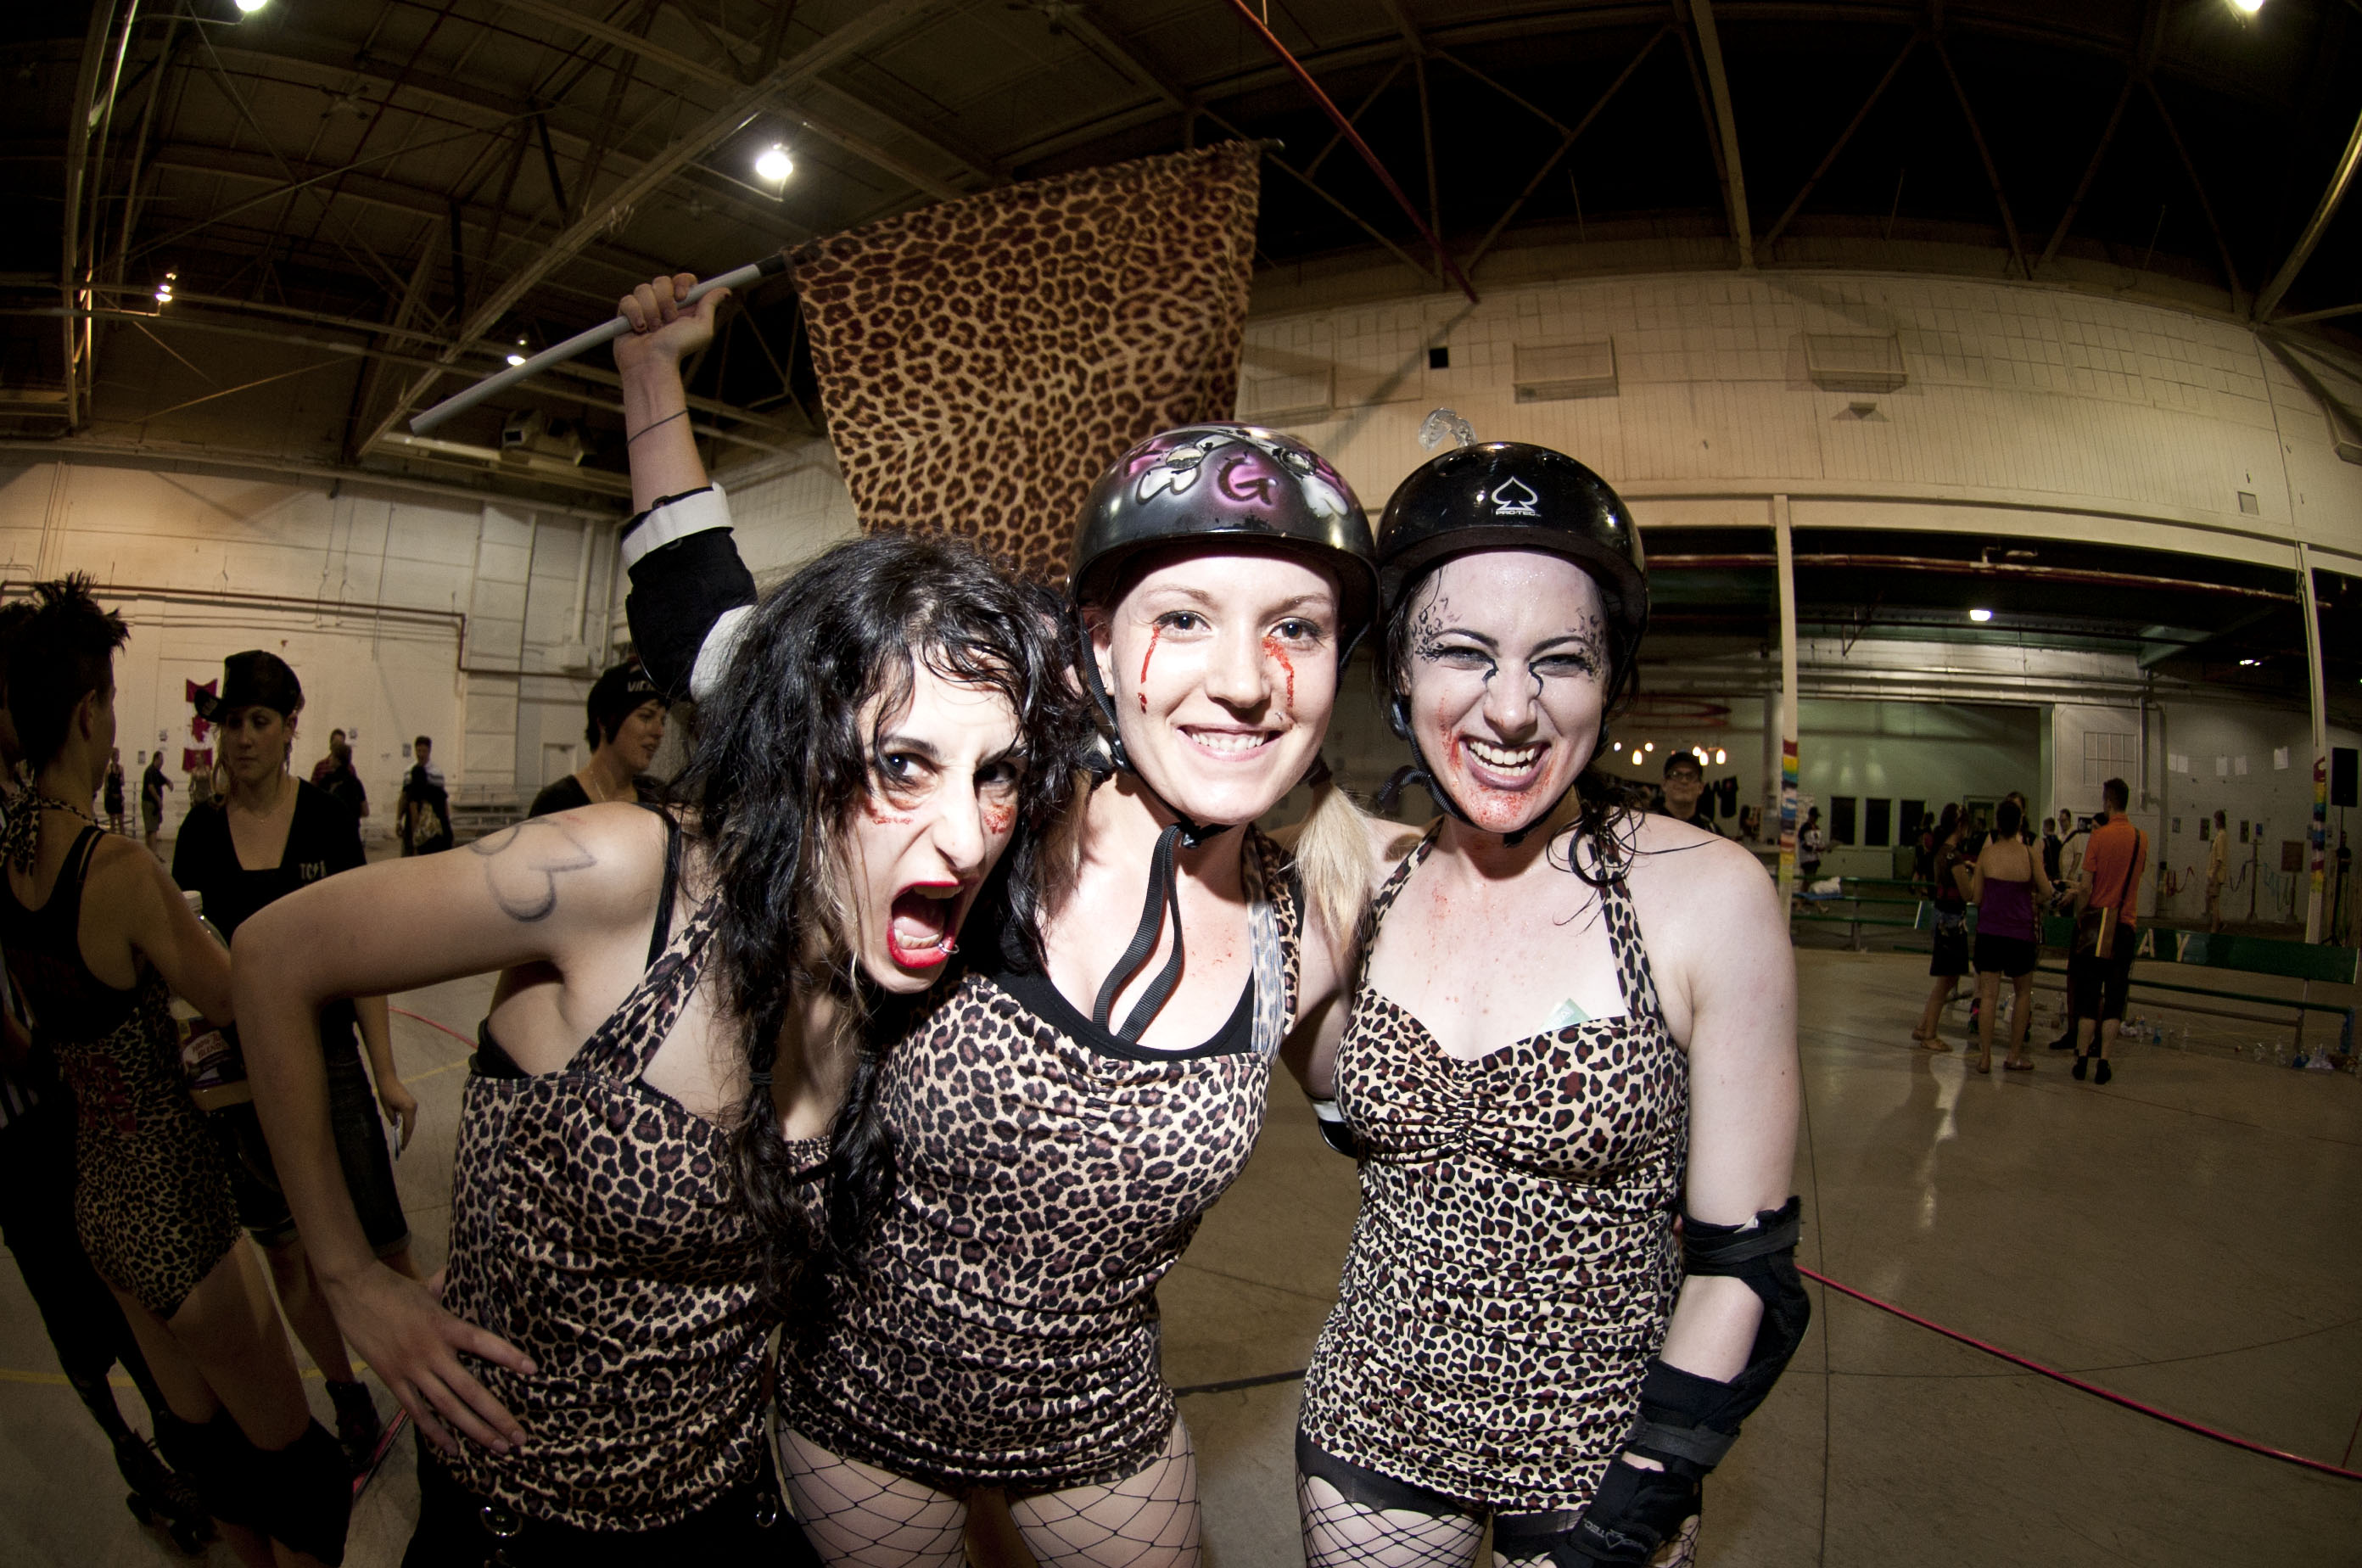 Hot roller derby girls nude